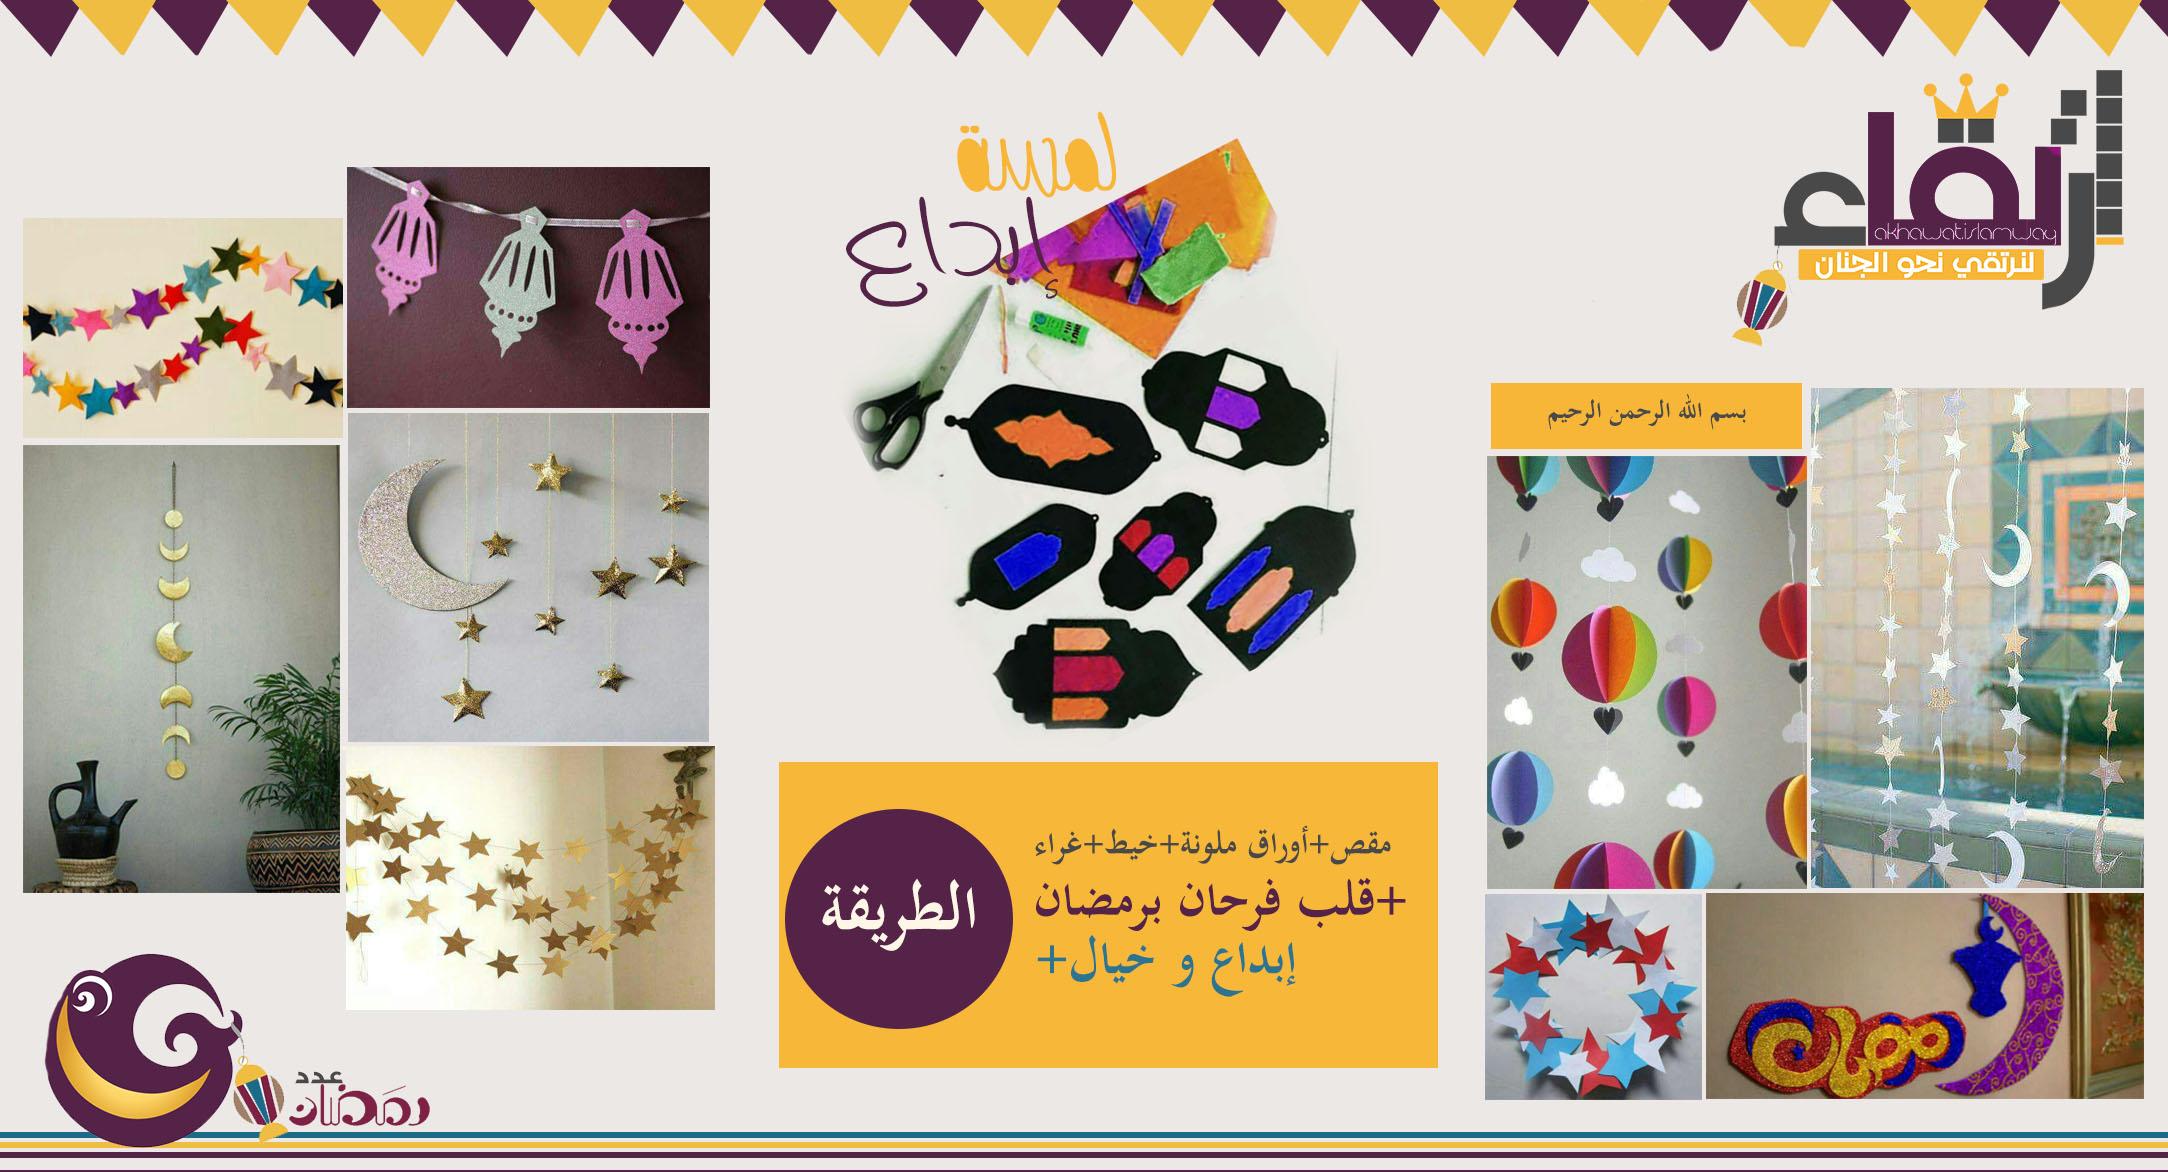 akhawat_islamway_1495227331___.jpg